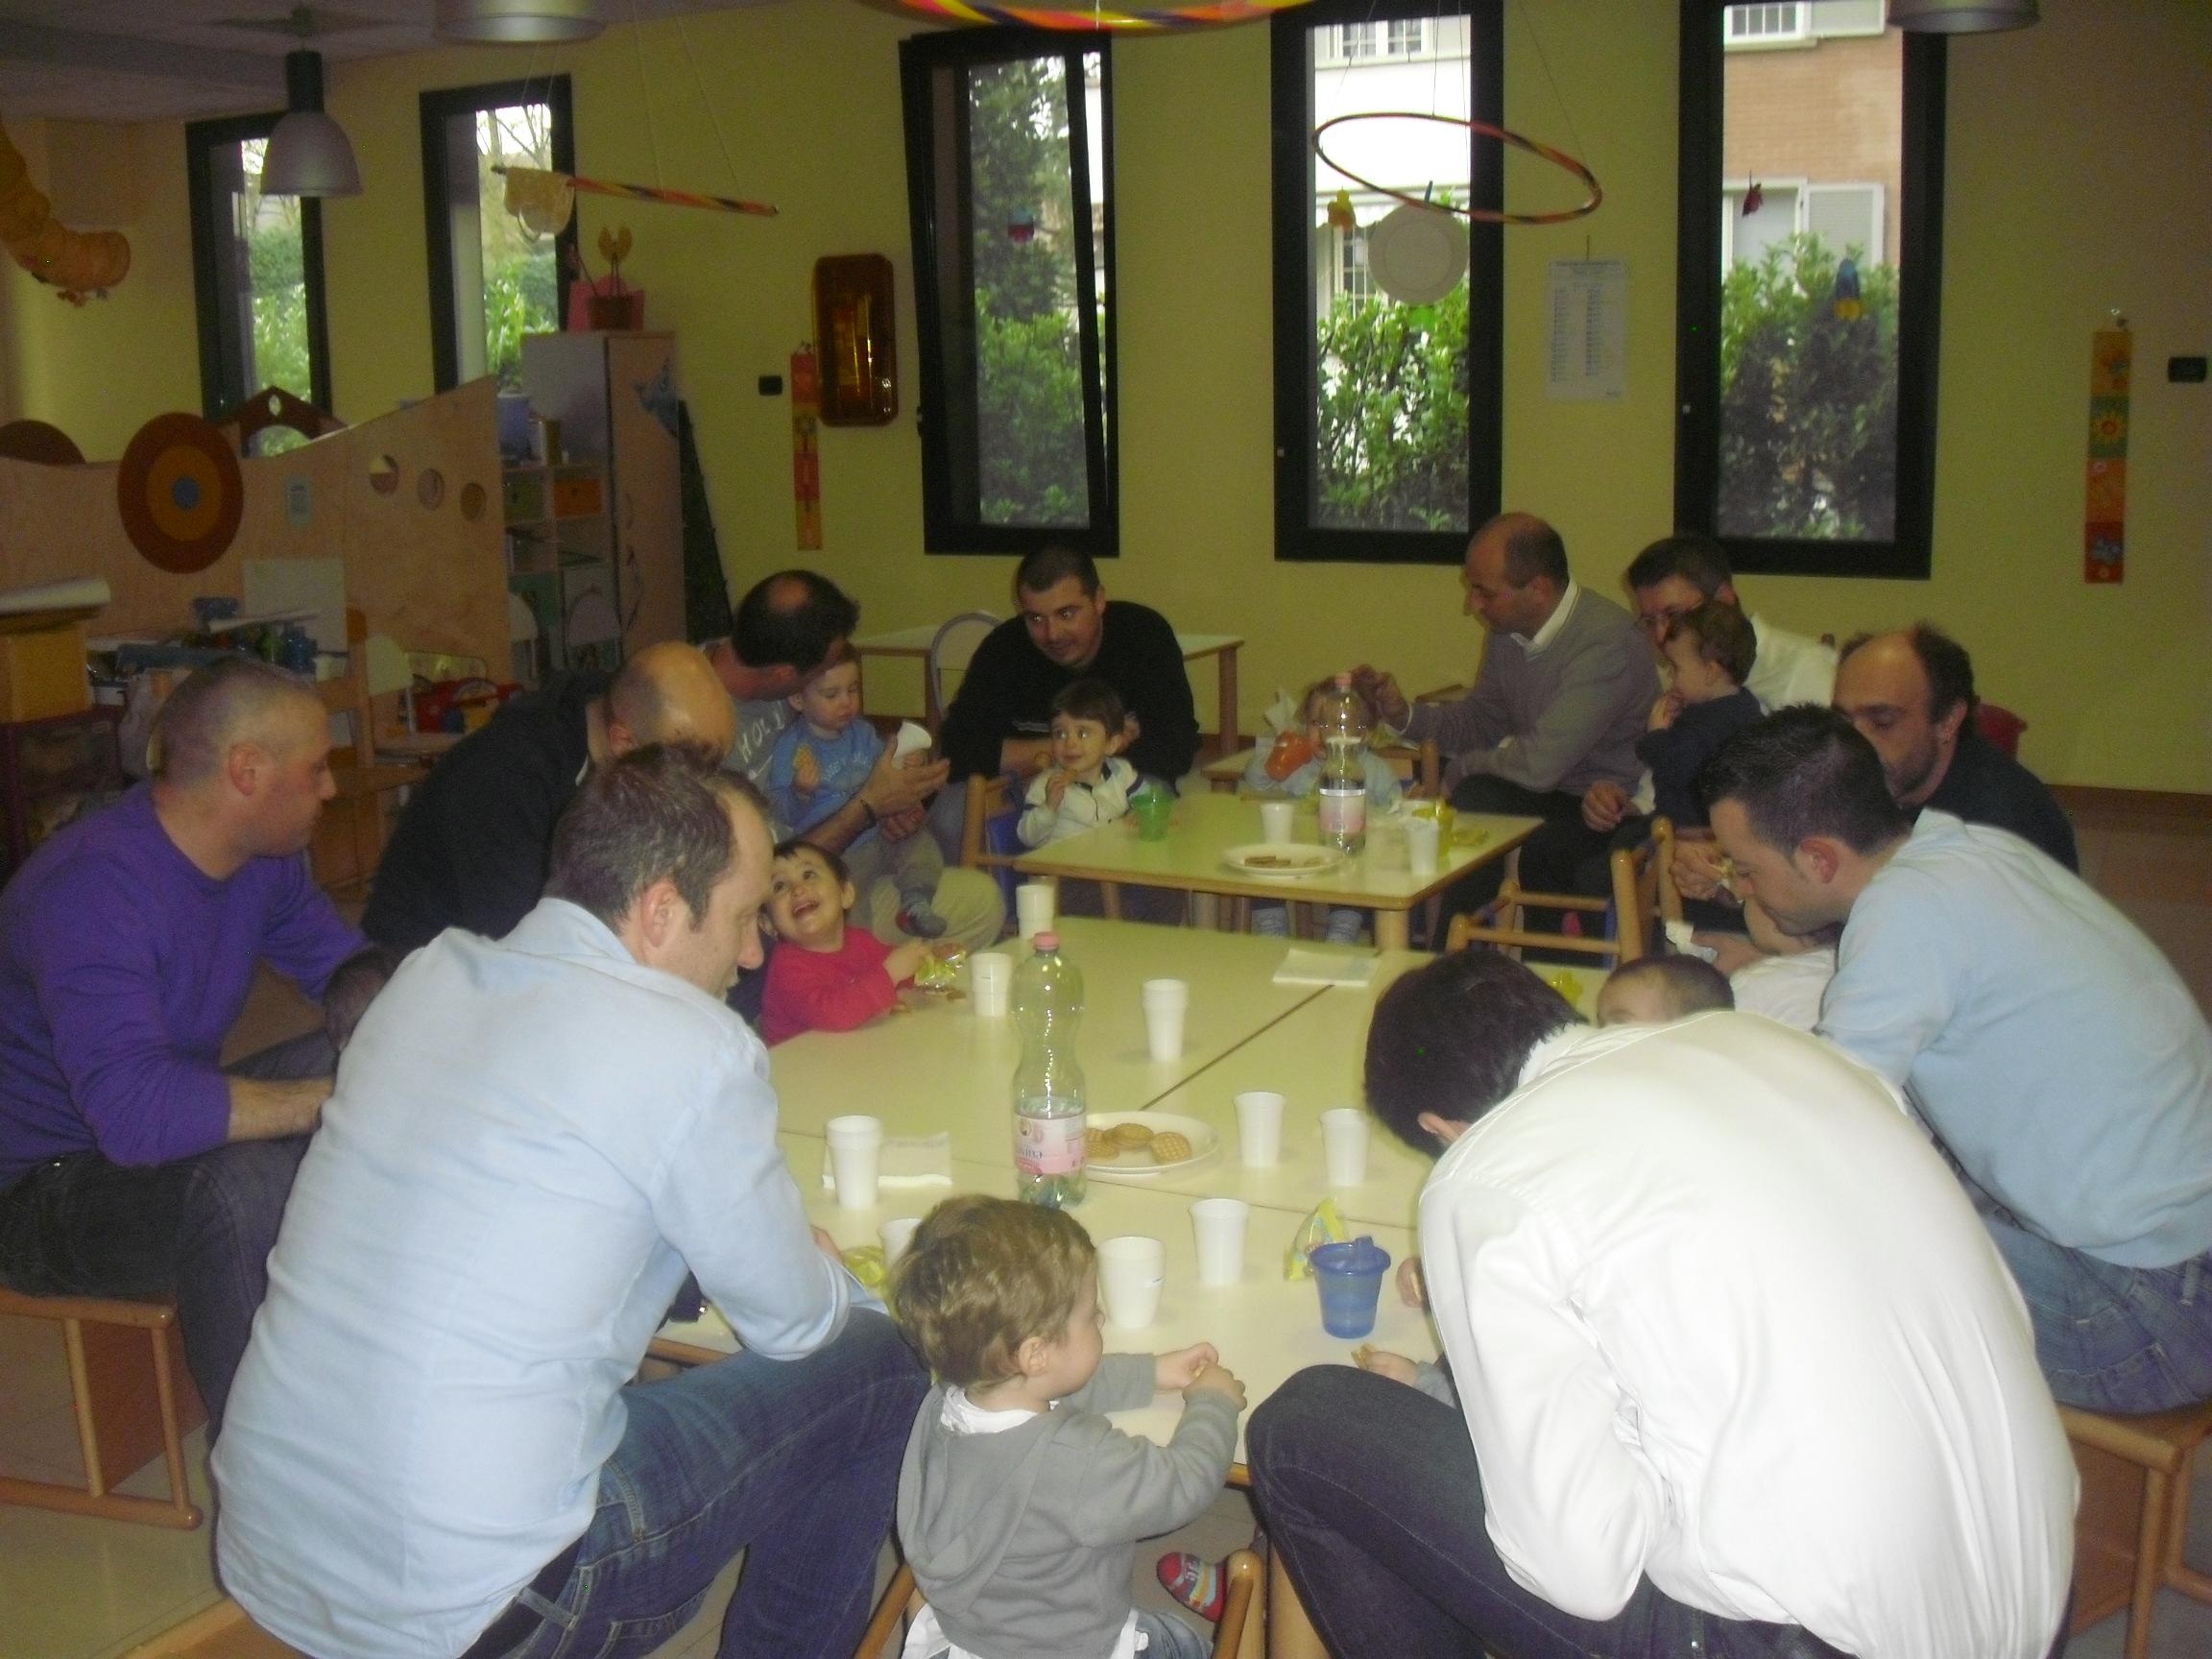 Festa del papa asilo nido la trottola for Arredamento asilo nido usato